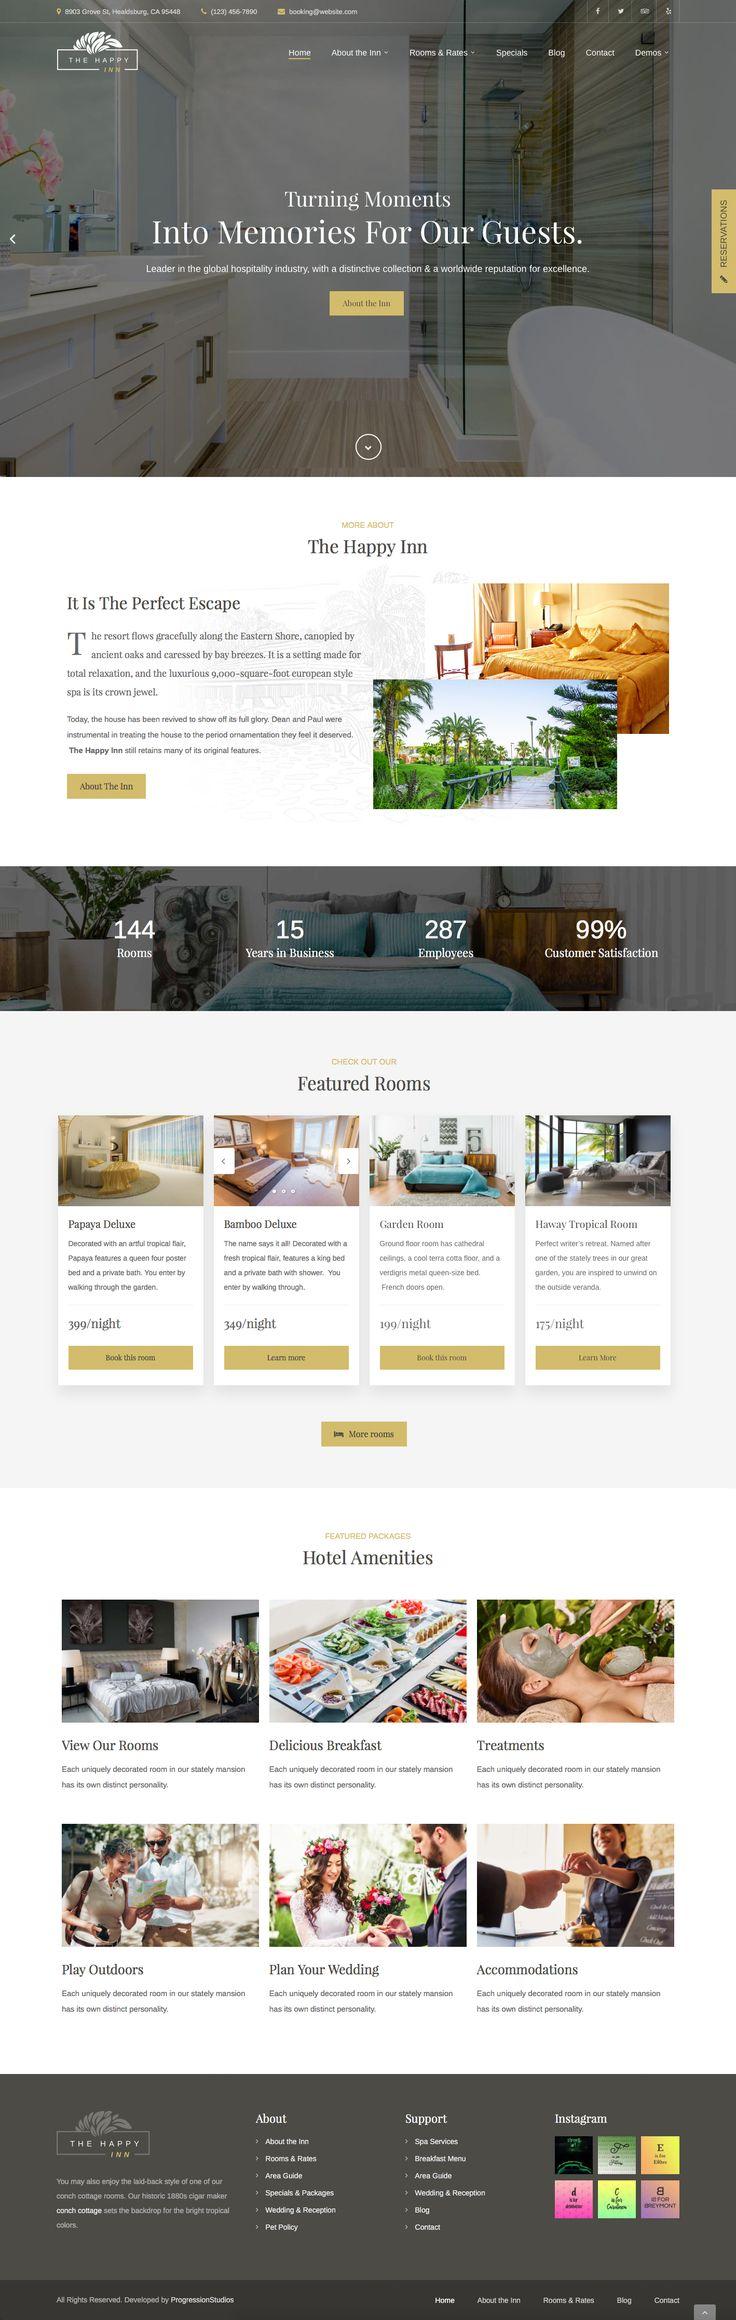 The Happy Inn #wordpress #business #hotel #hotel directory • Download ➝ https://themeforest.net/item/the-happy-inn-hotel-bed-breakfast-theme/19710298?ref=pxcr